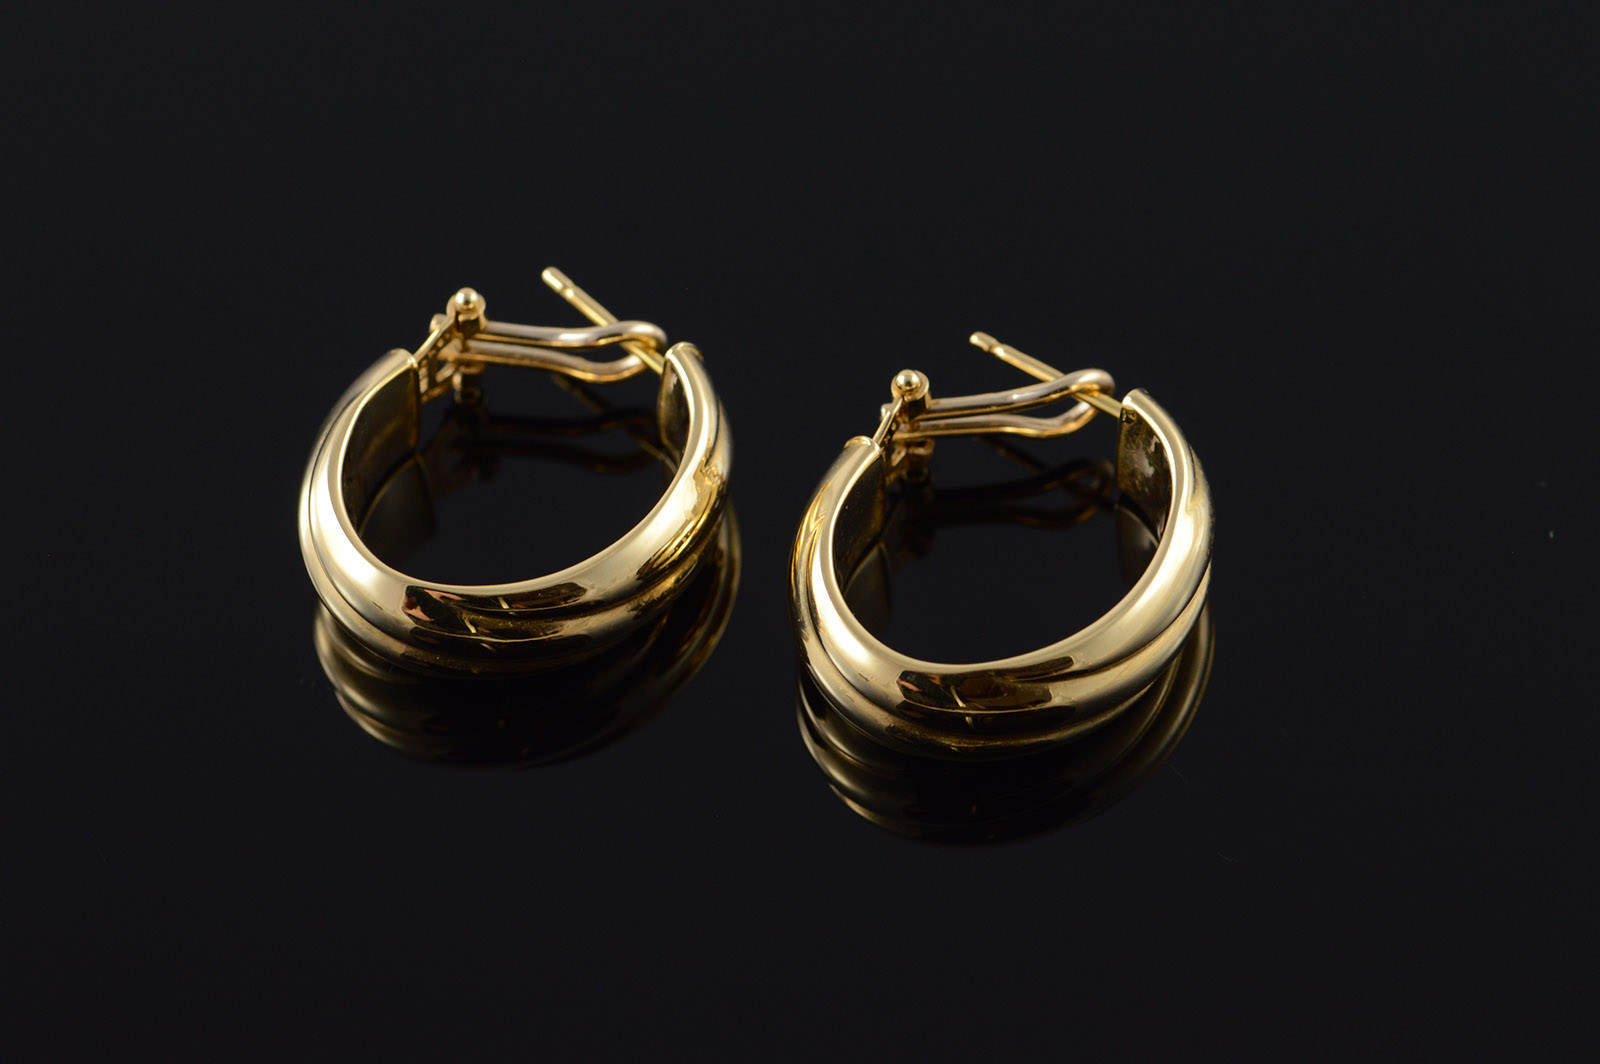 18k Hollow Hoop Twist French Clip Yellow Gold Earrings